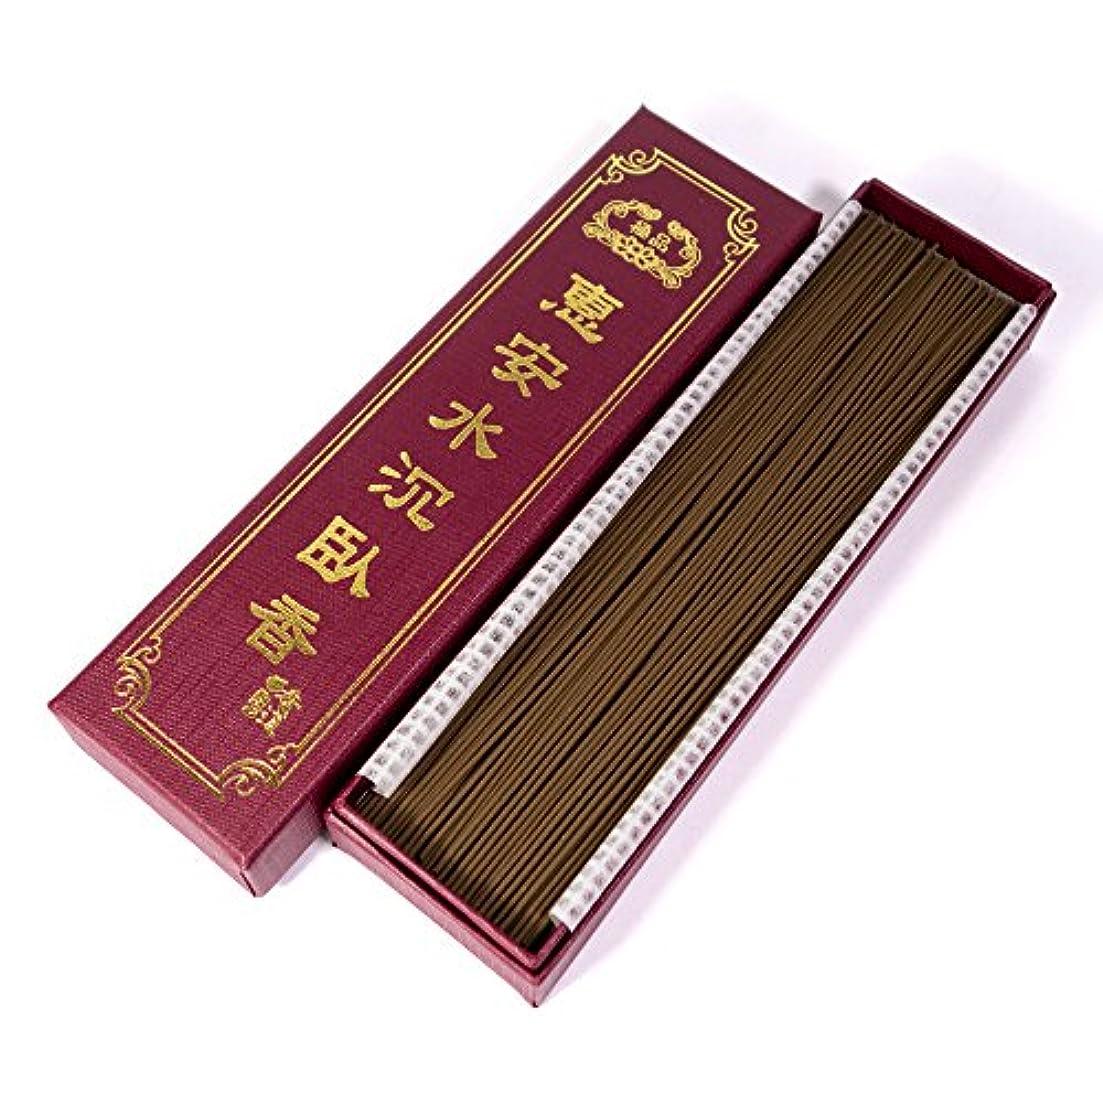 唯一明確にバリア台湾沉香舍 お香 香木 線香 水沈香 惠安水沈香 煙少香 21cm 75g 約220本